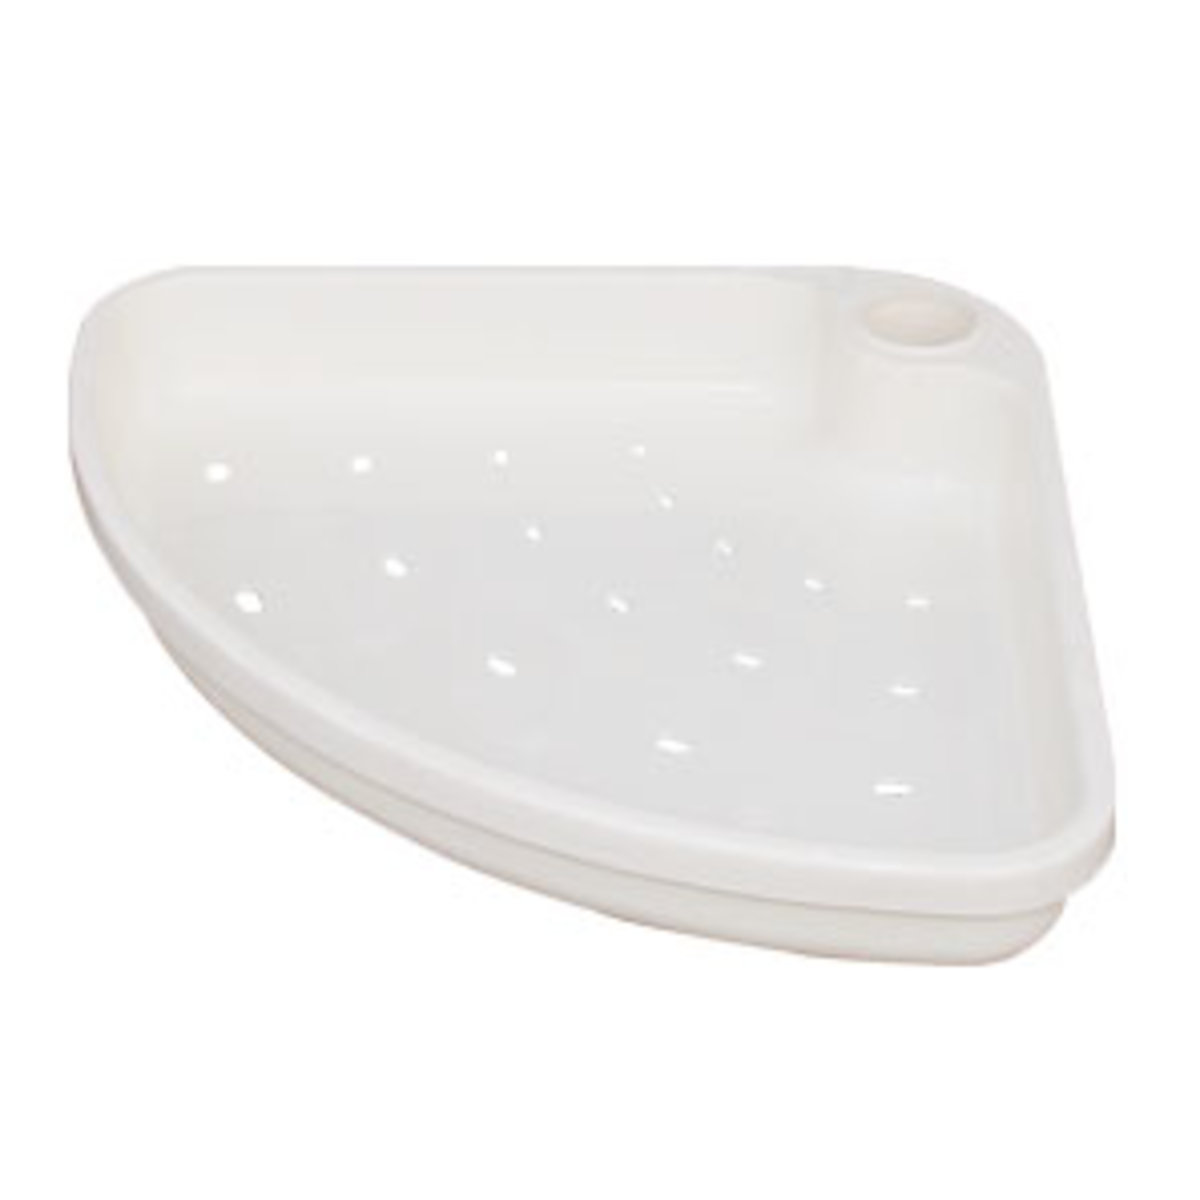 DIY組合衣架配件-三角盤,1件裝